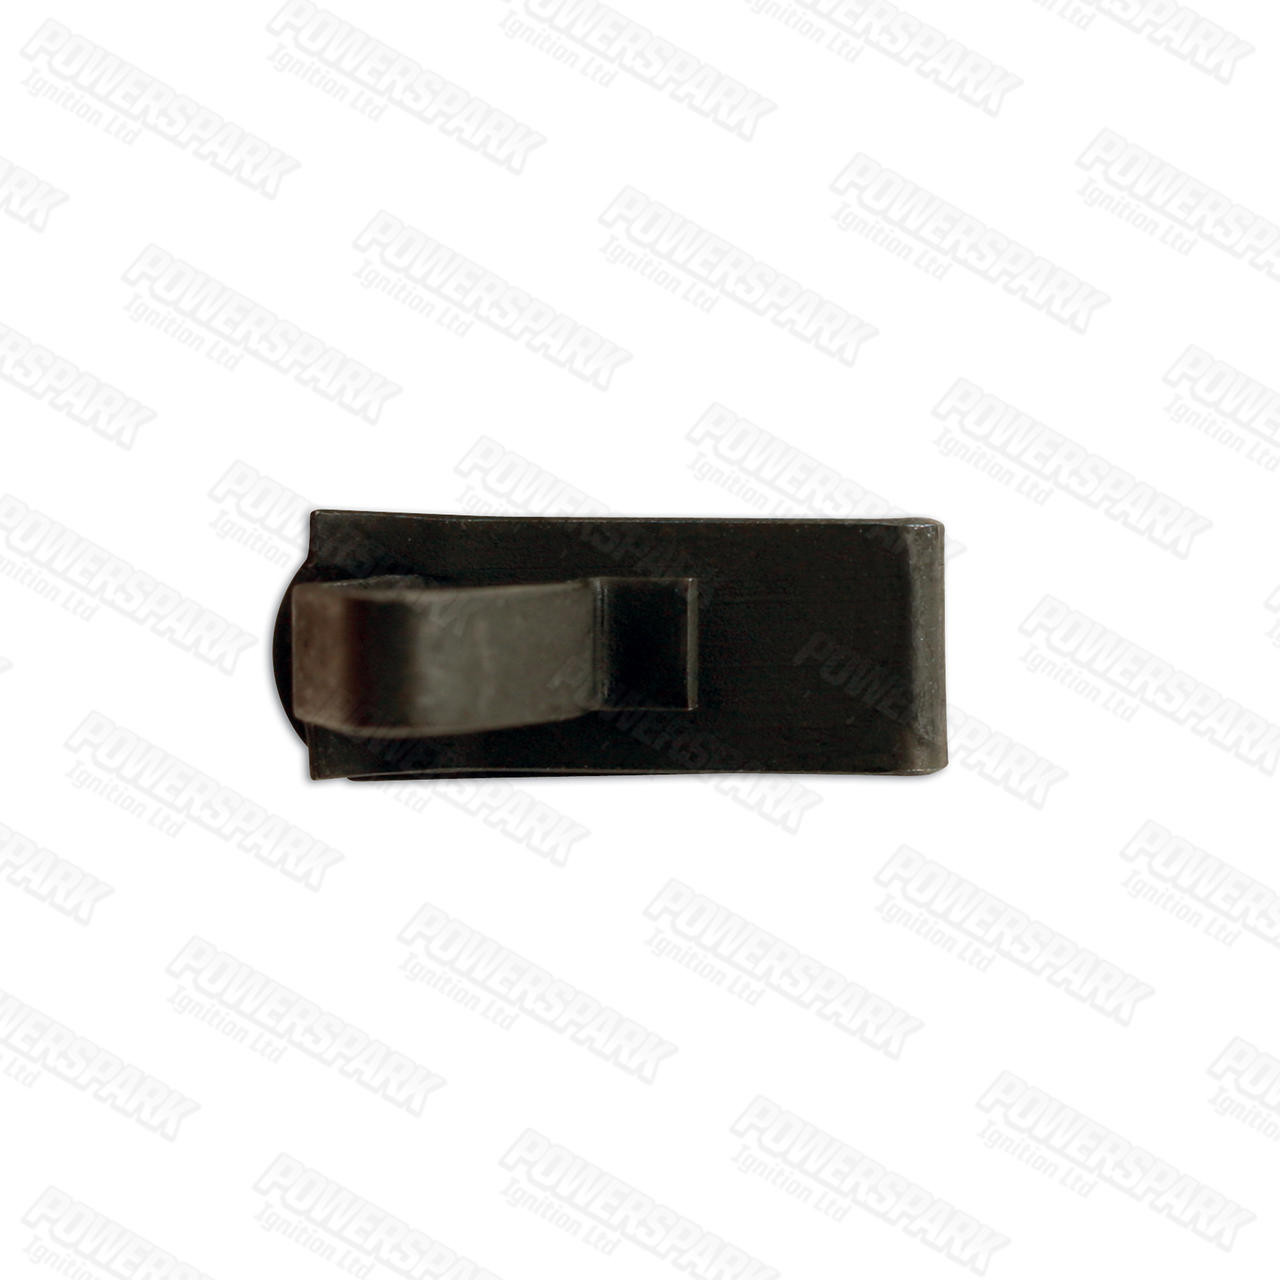 Laser Classic MG Door Trim Clip B Pack of 25